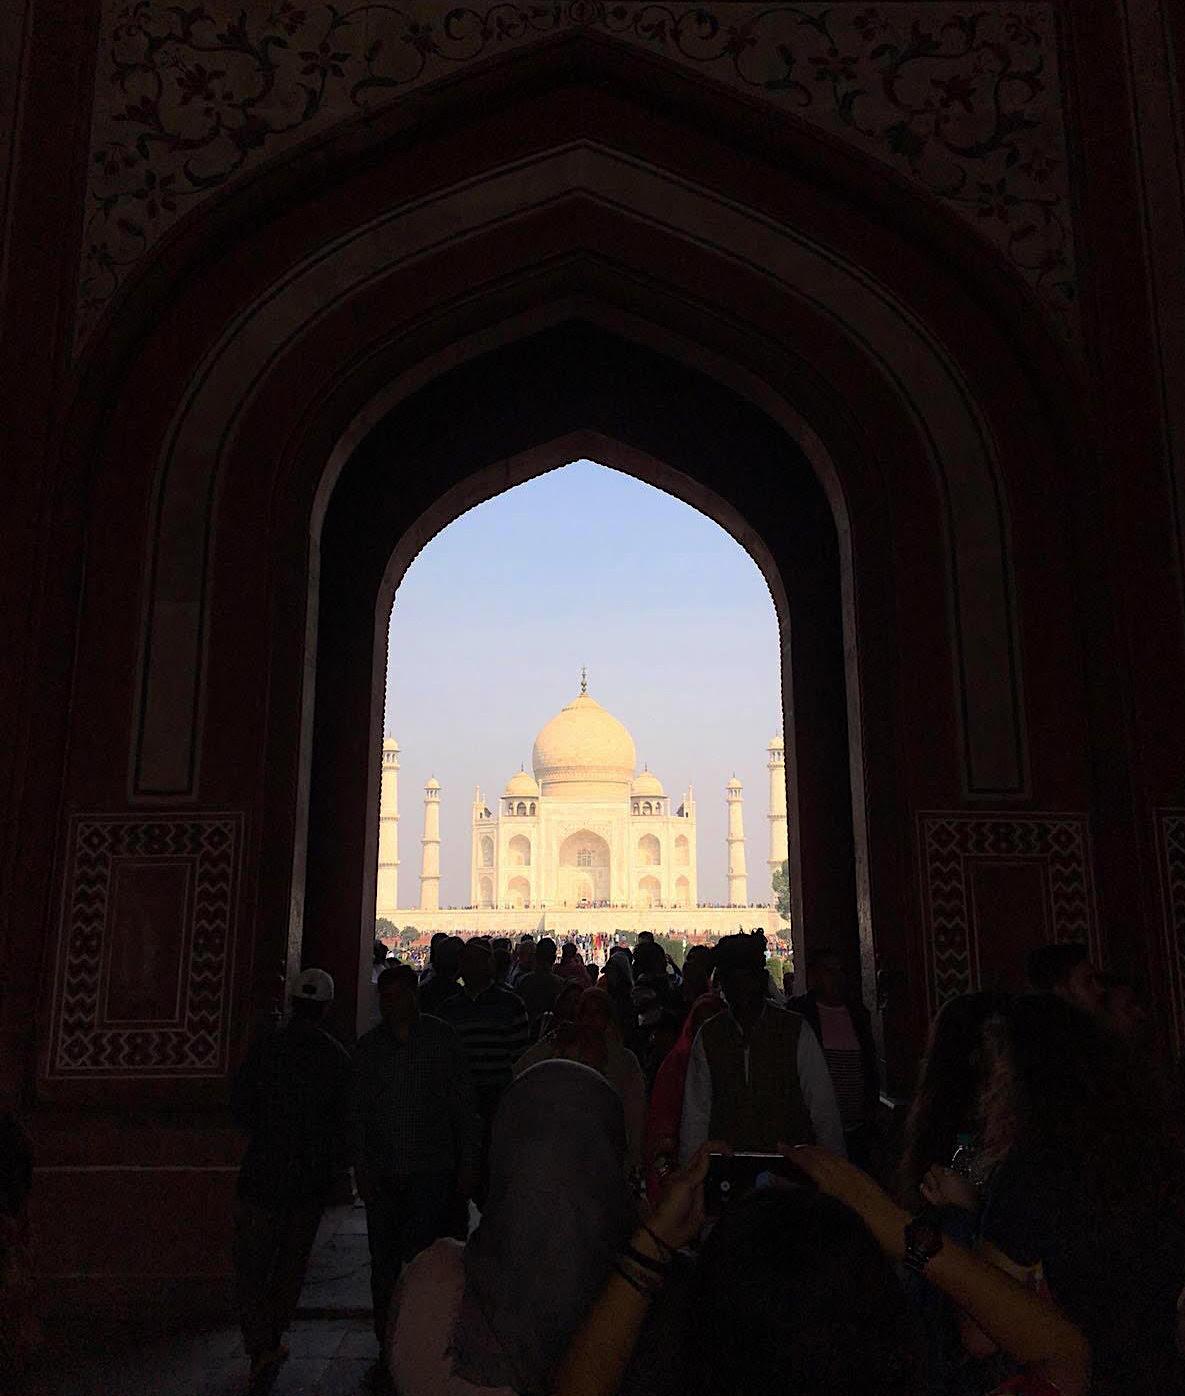 tac mahal - hindistan gezilecek yerler